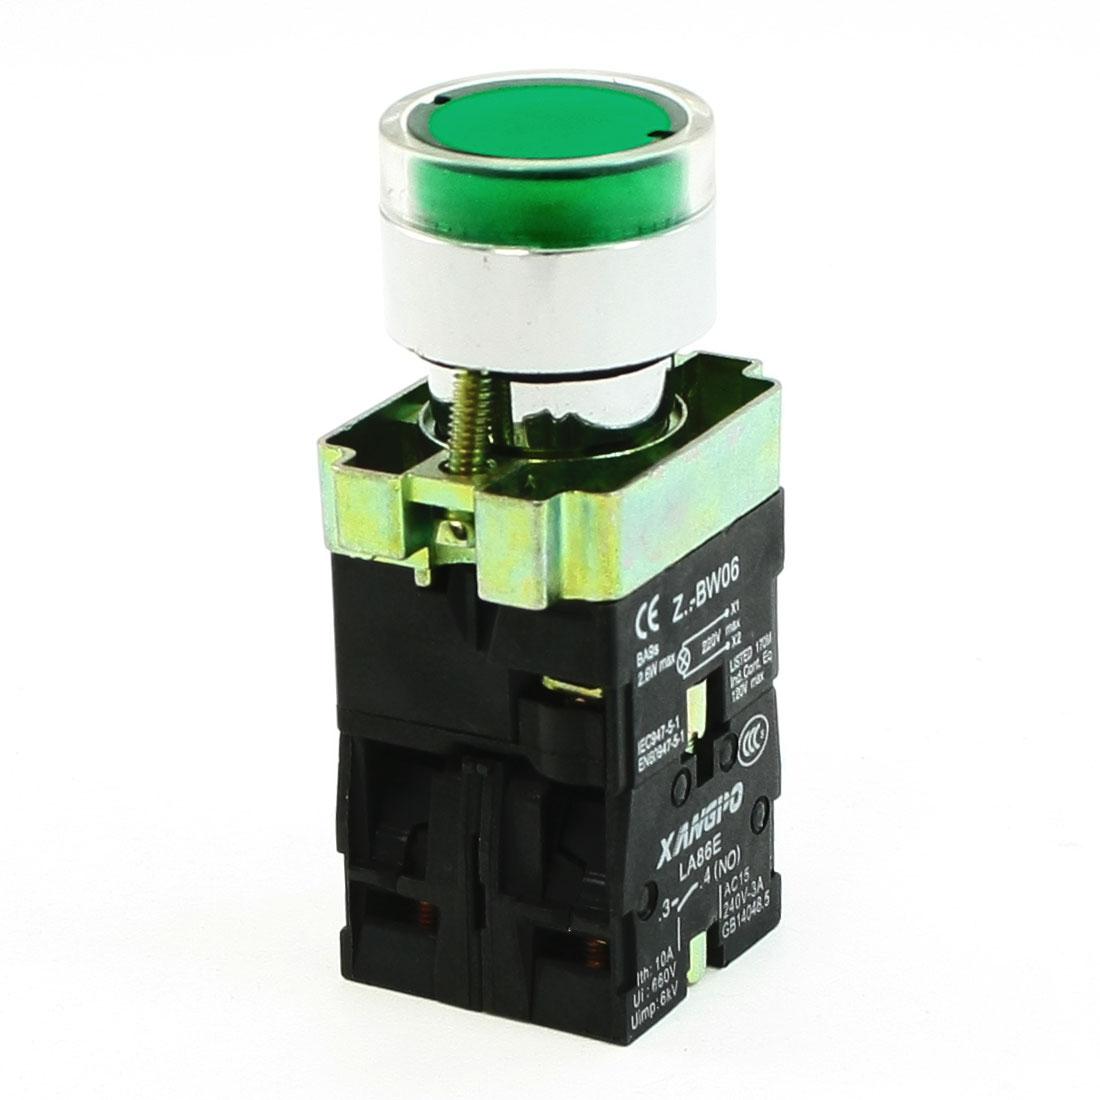 220V AC Indicator Light AC240V 3A 1NO 1NC Green Momentary Push Button Switch